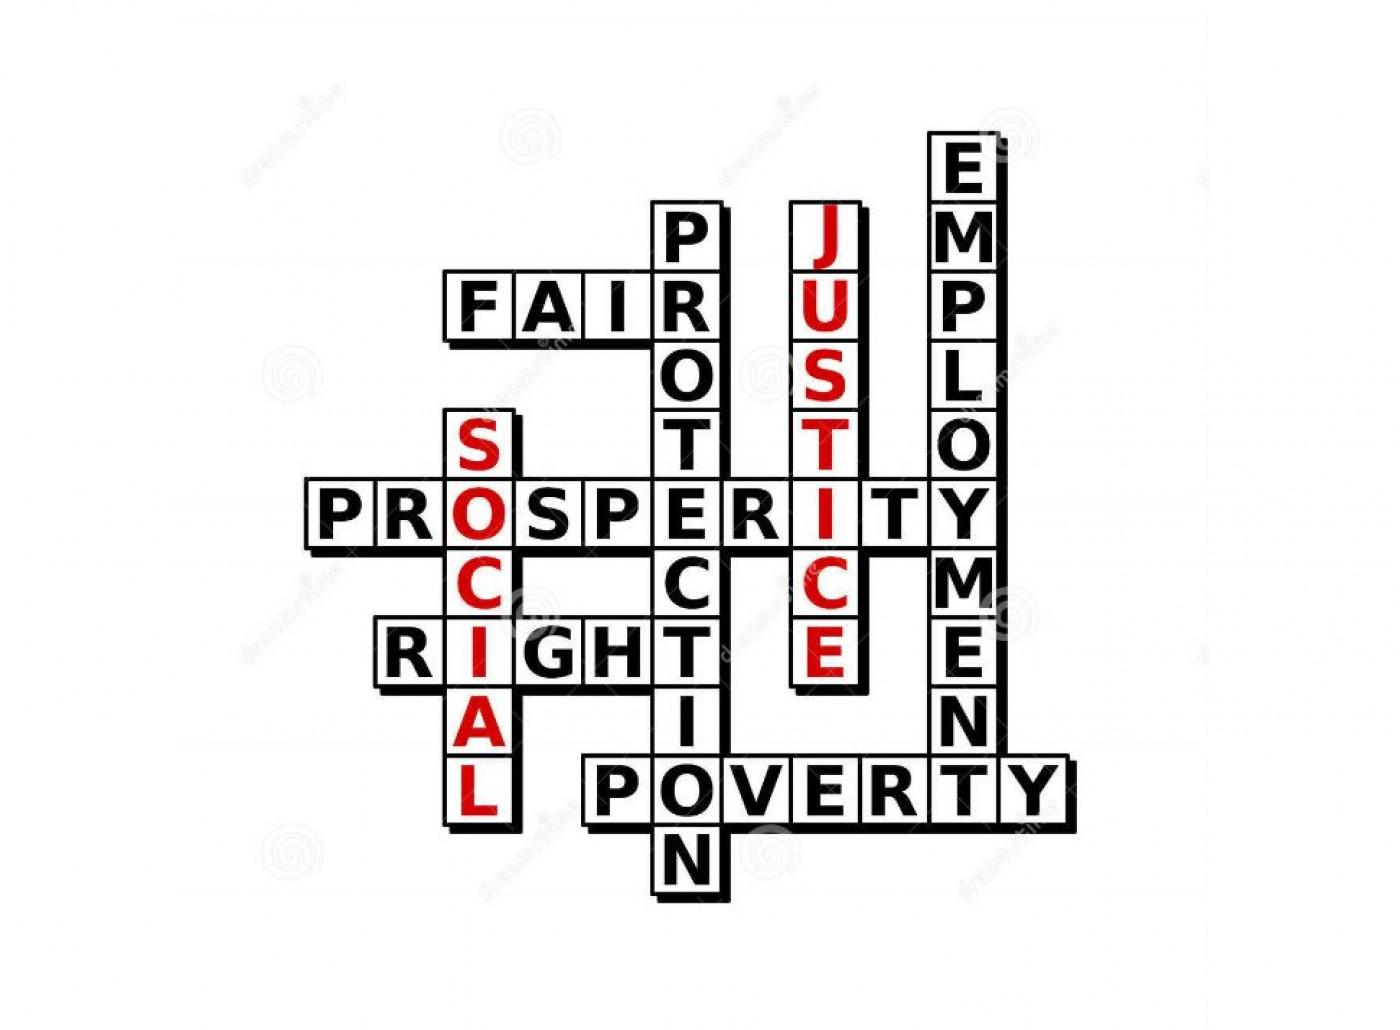 003 Surprising Prosperity Crossword Photo  National Economic Clue Nyt Prosperou 11 Letter 101400